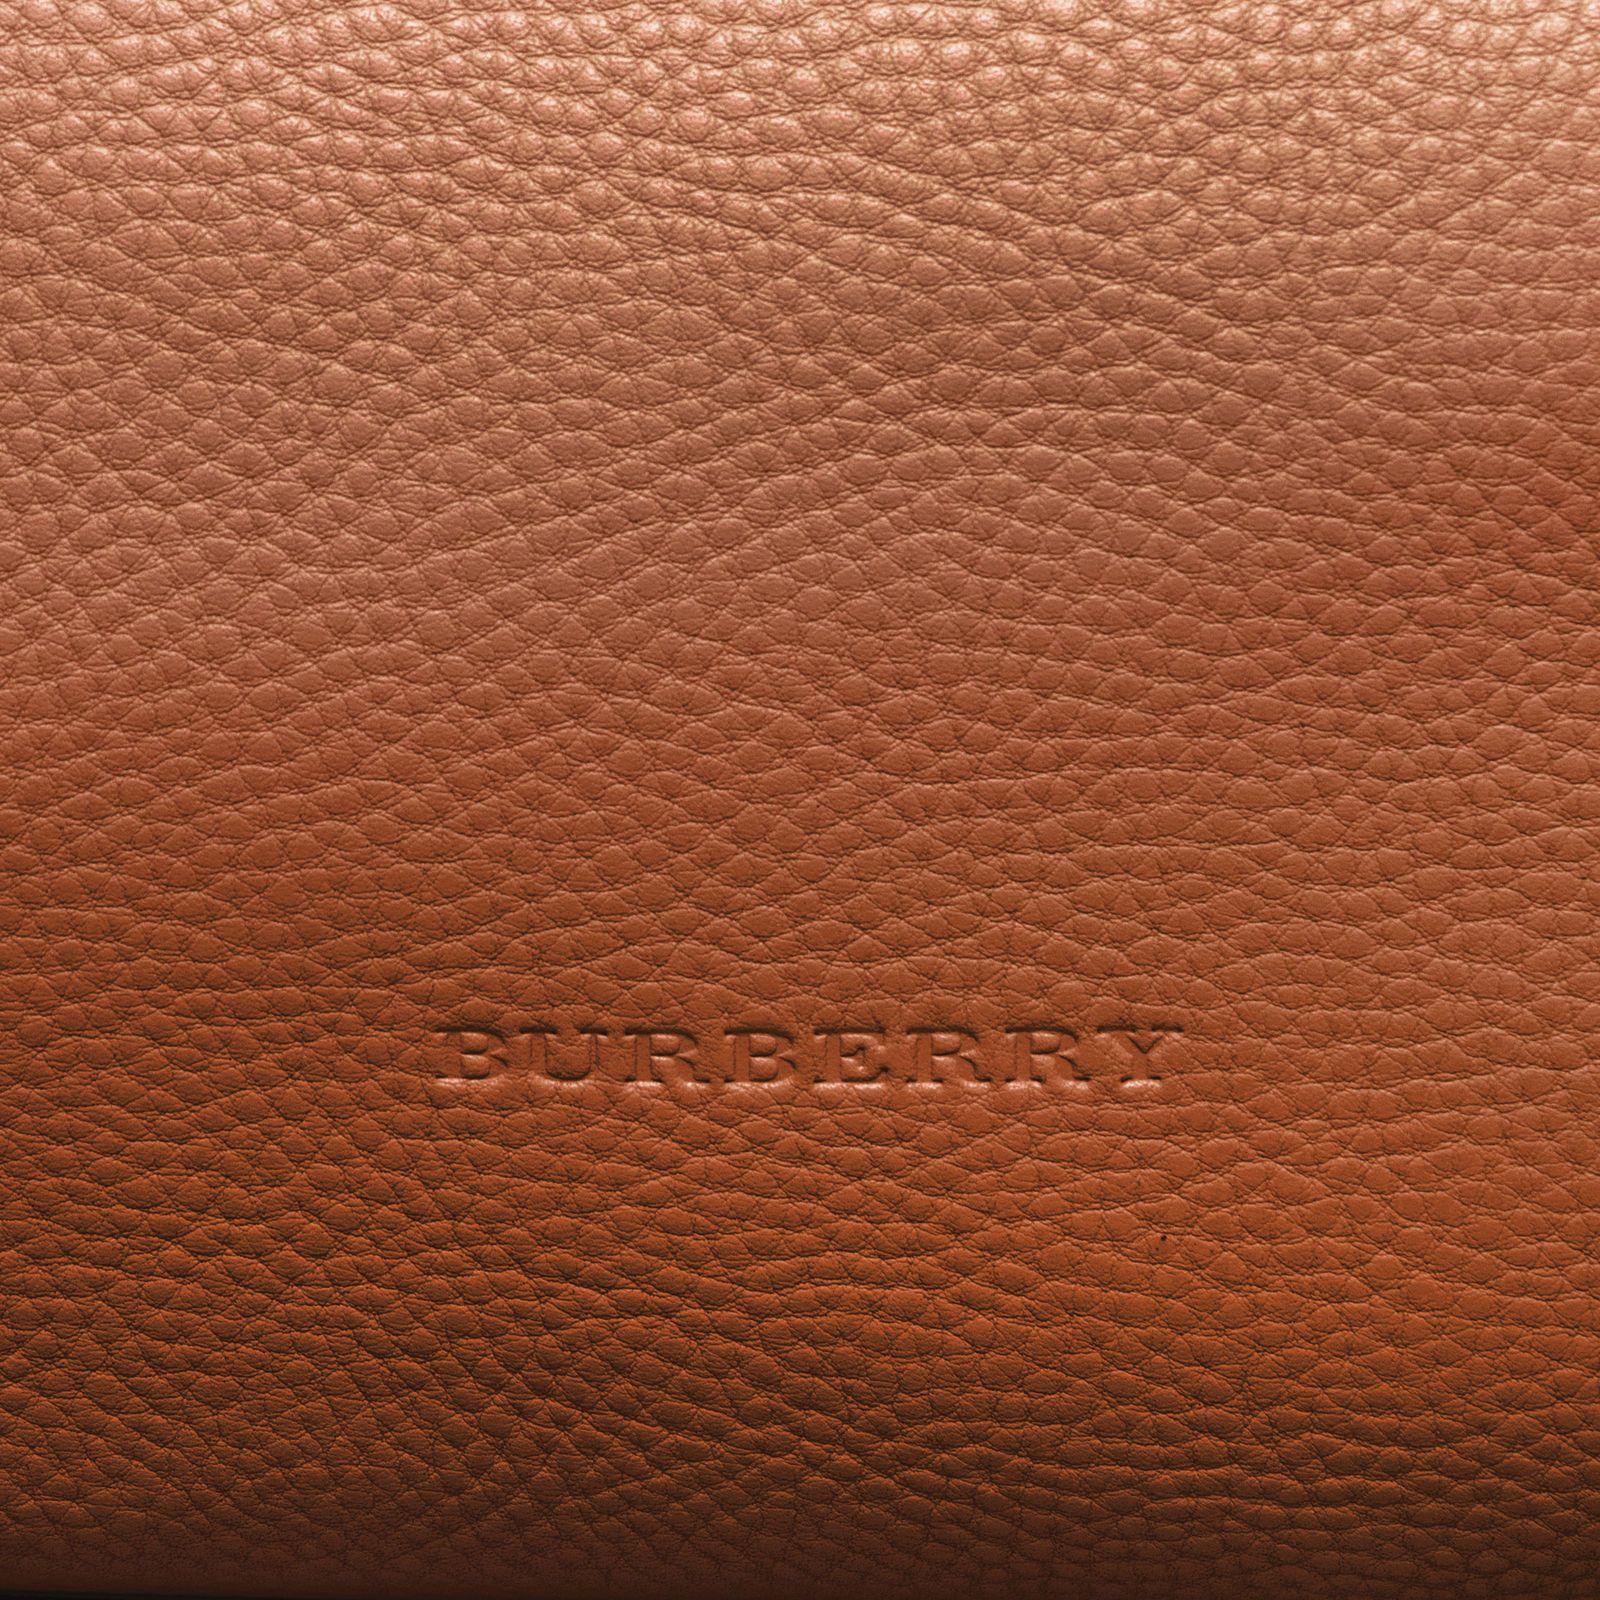 Burberry Women s Brit Medium Maidstone Leather and Canvas Handbag Brown   629.99  burberry  handbag ef7d2f606a945